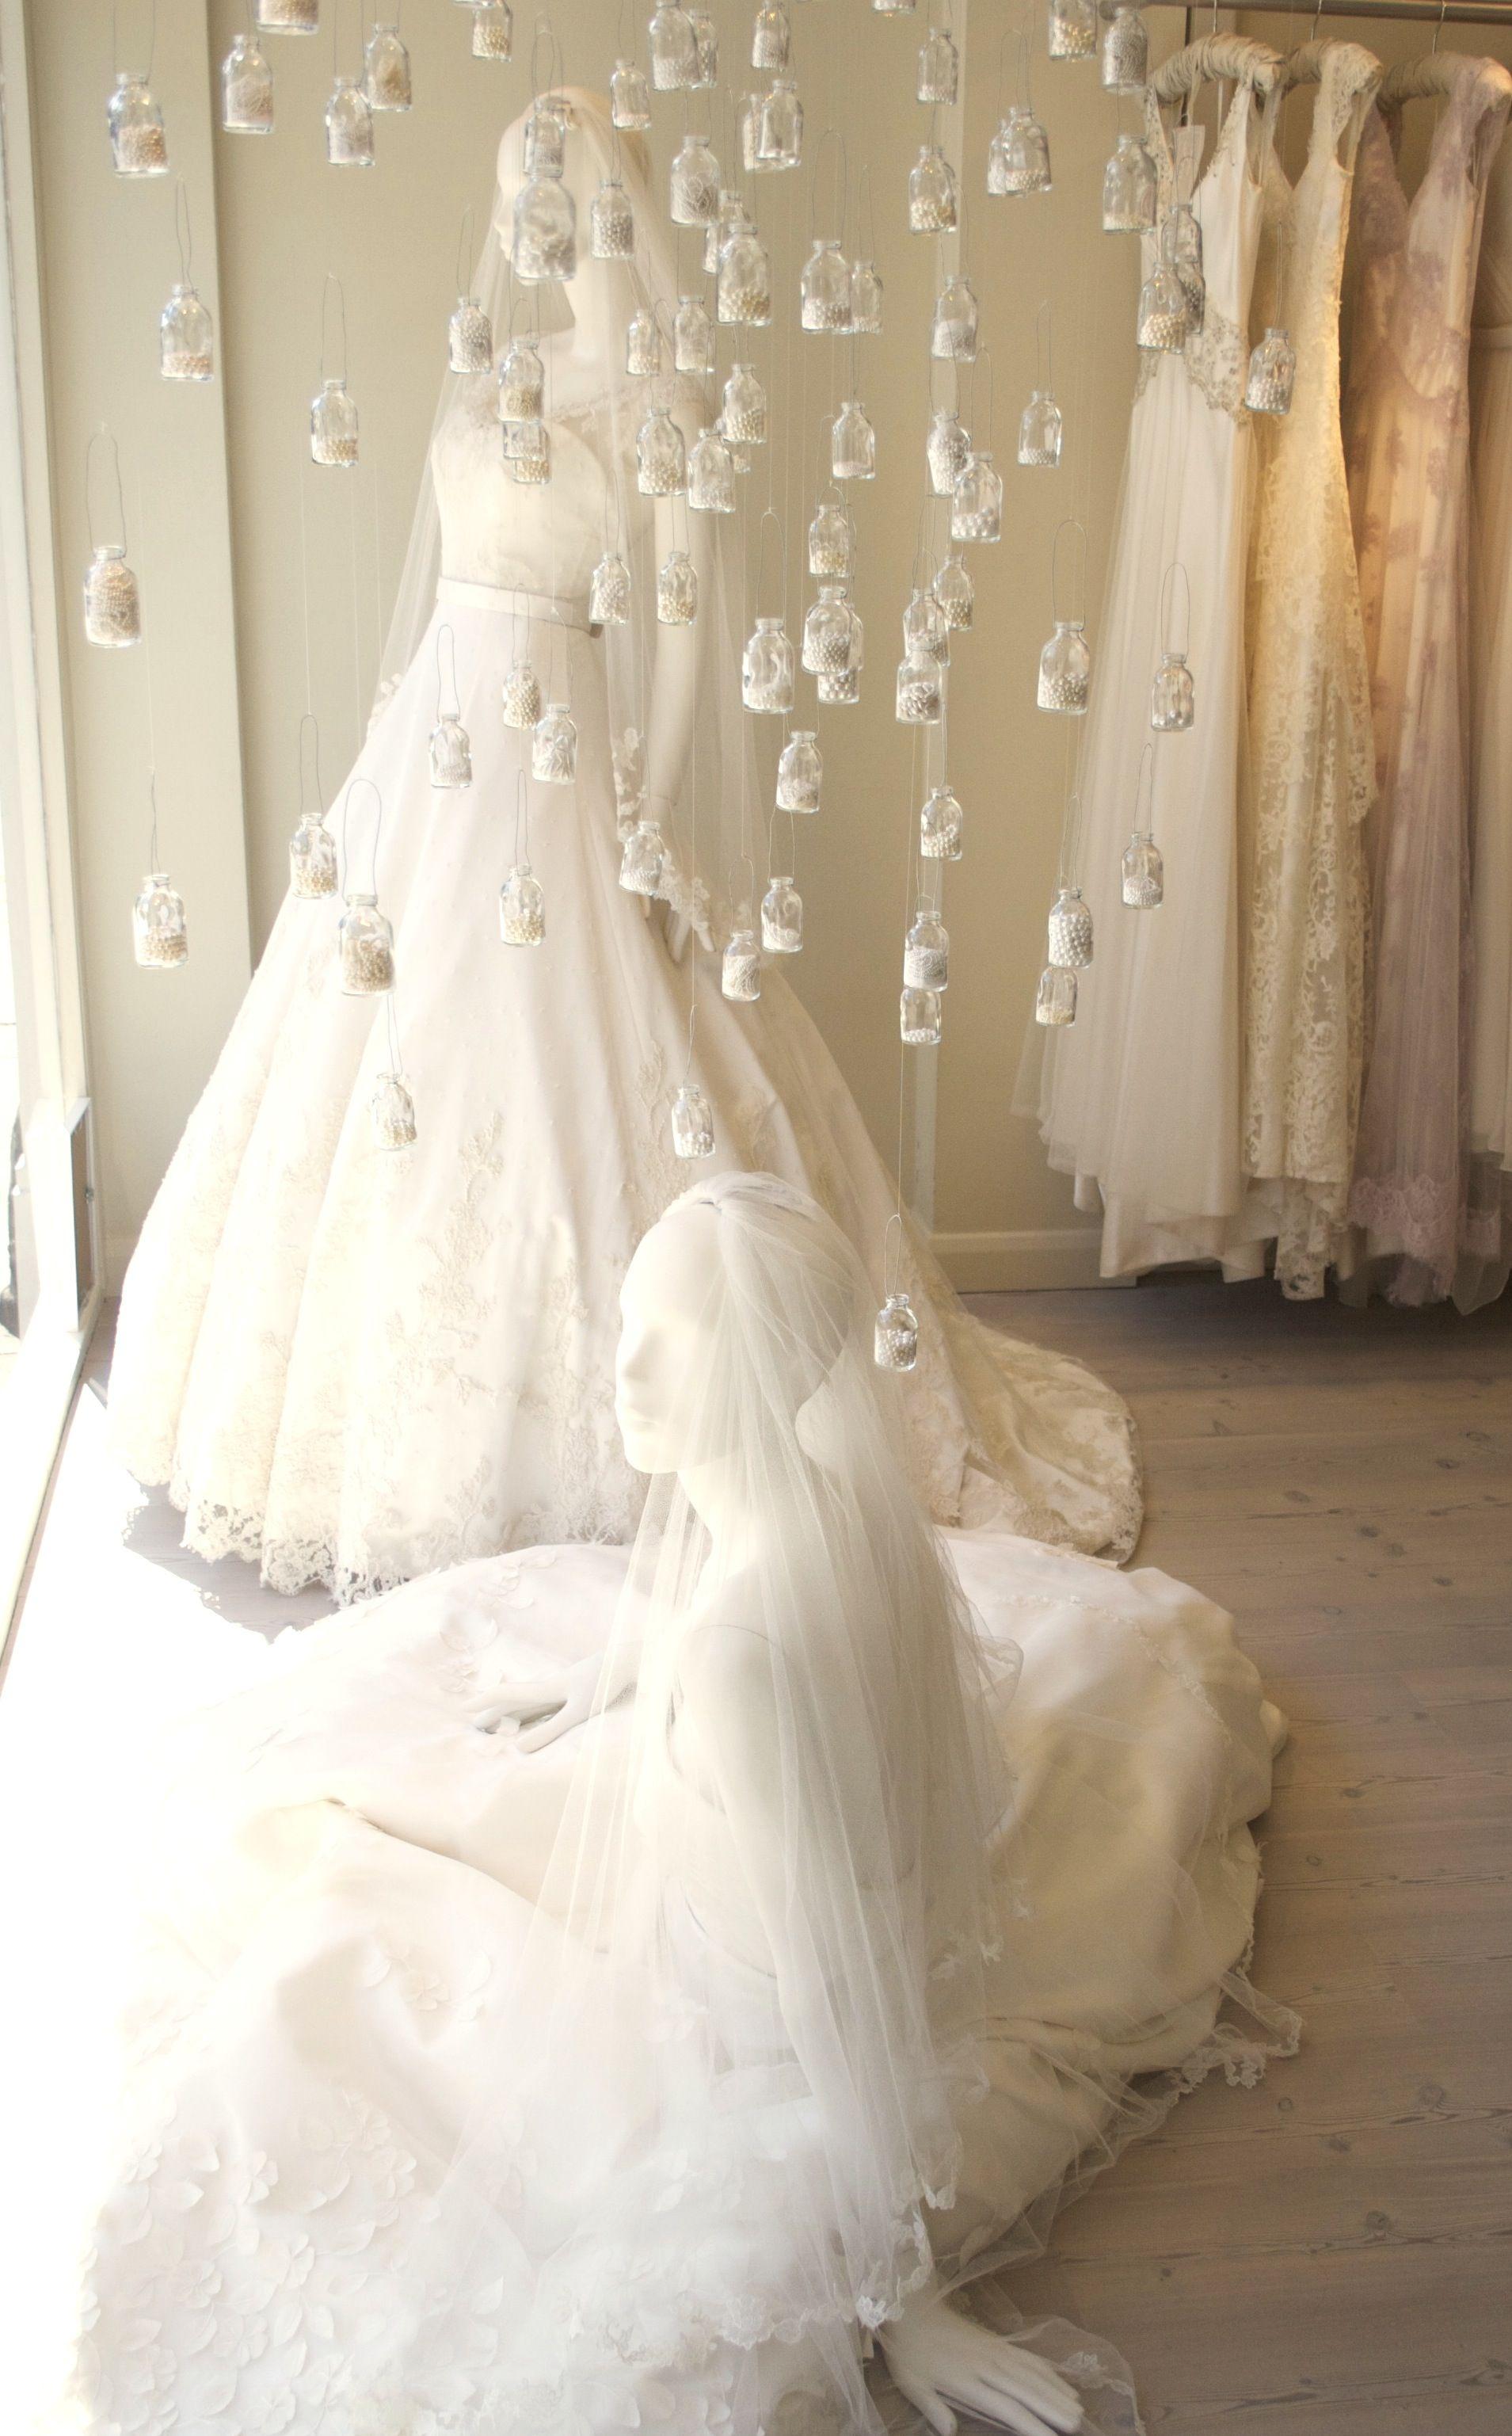 Phillipa lepley windows pearly brides illipaleple